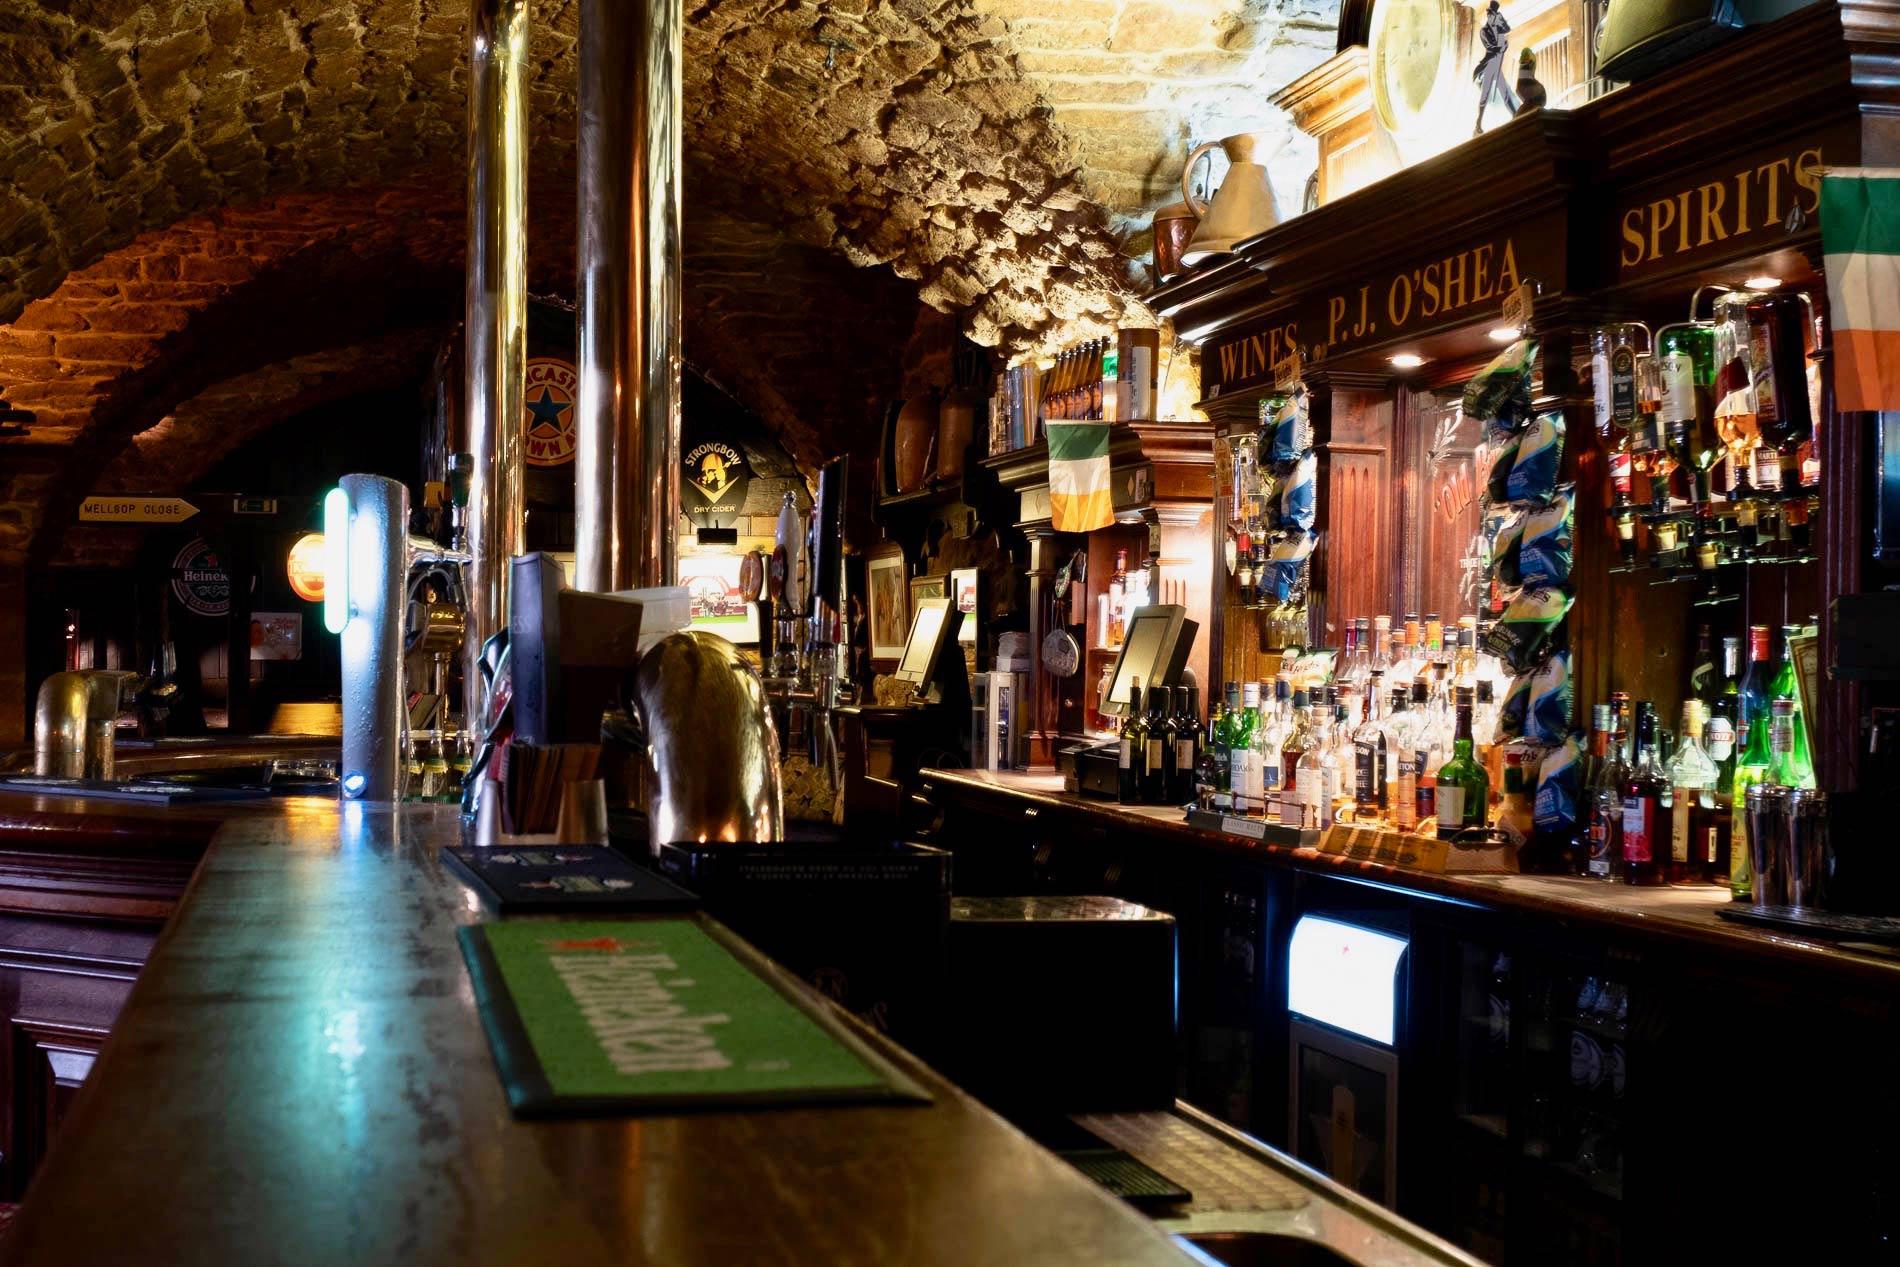 Startseite o 39 sheas irish pub n rnberg for Bar 42 nurnberg